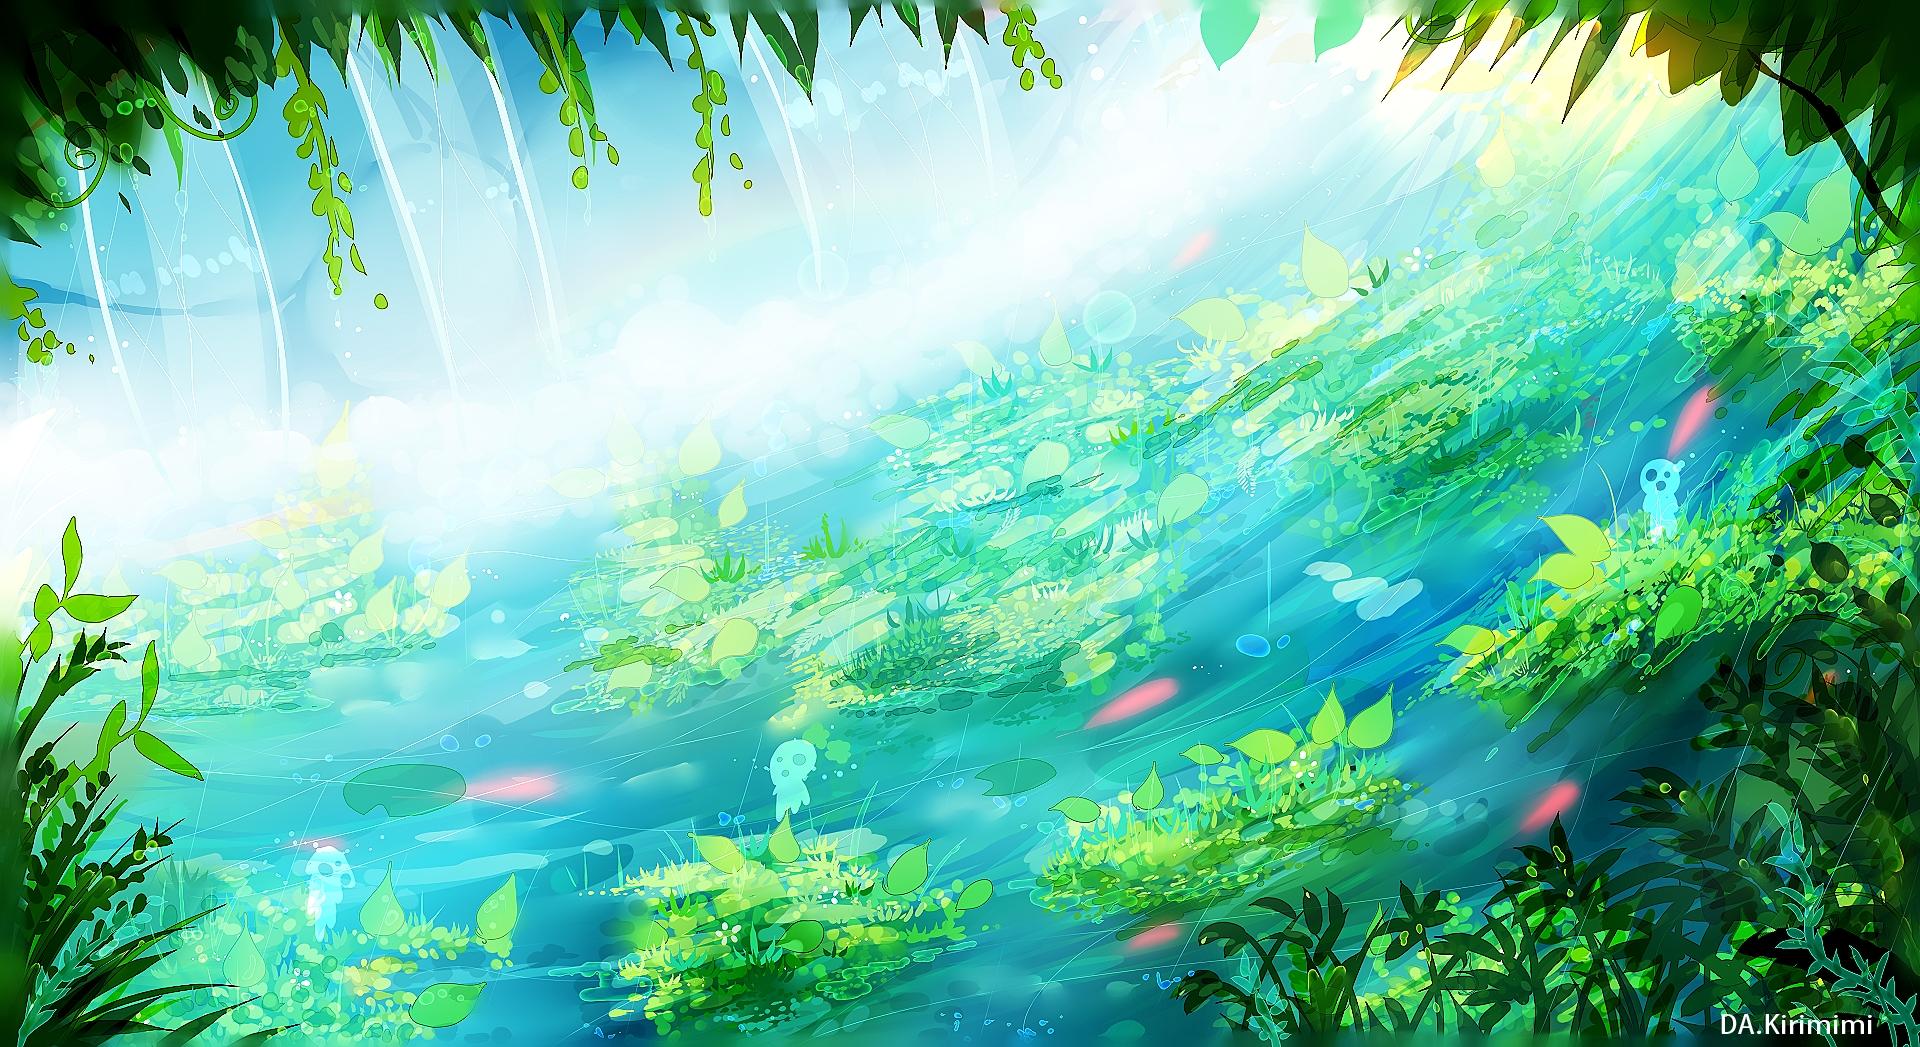 Fondo Animado Campo Parque Full Hd Animate Background: Mononoke Hime (Princess Mononoke) Wallpaper #1780182